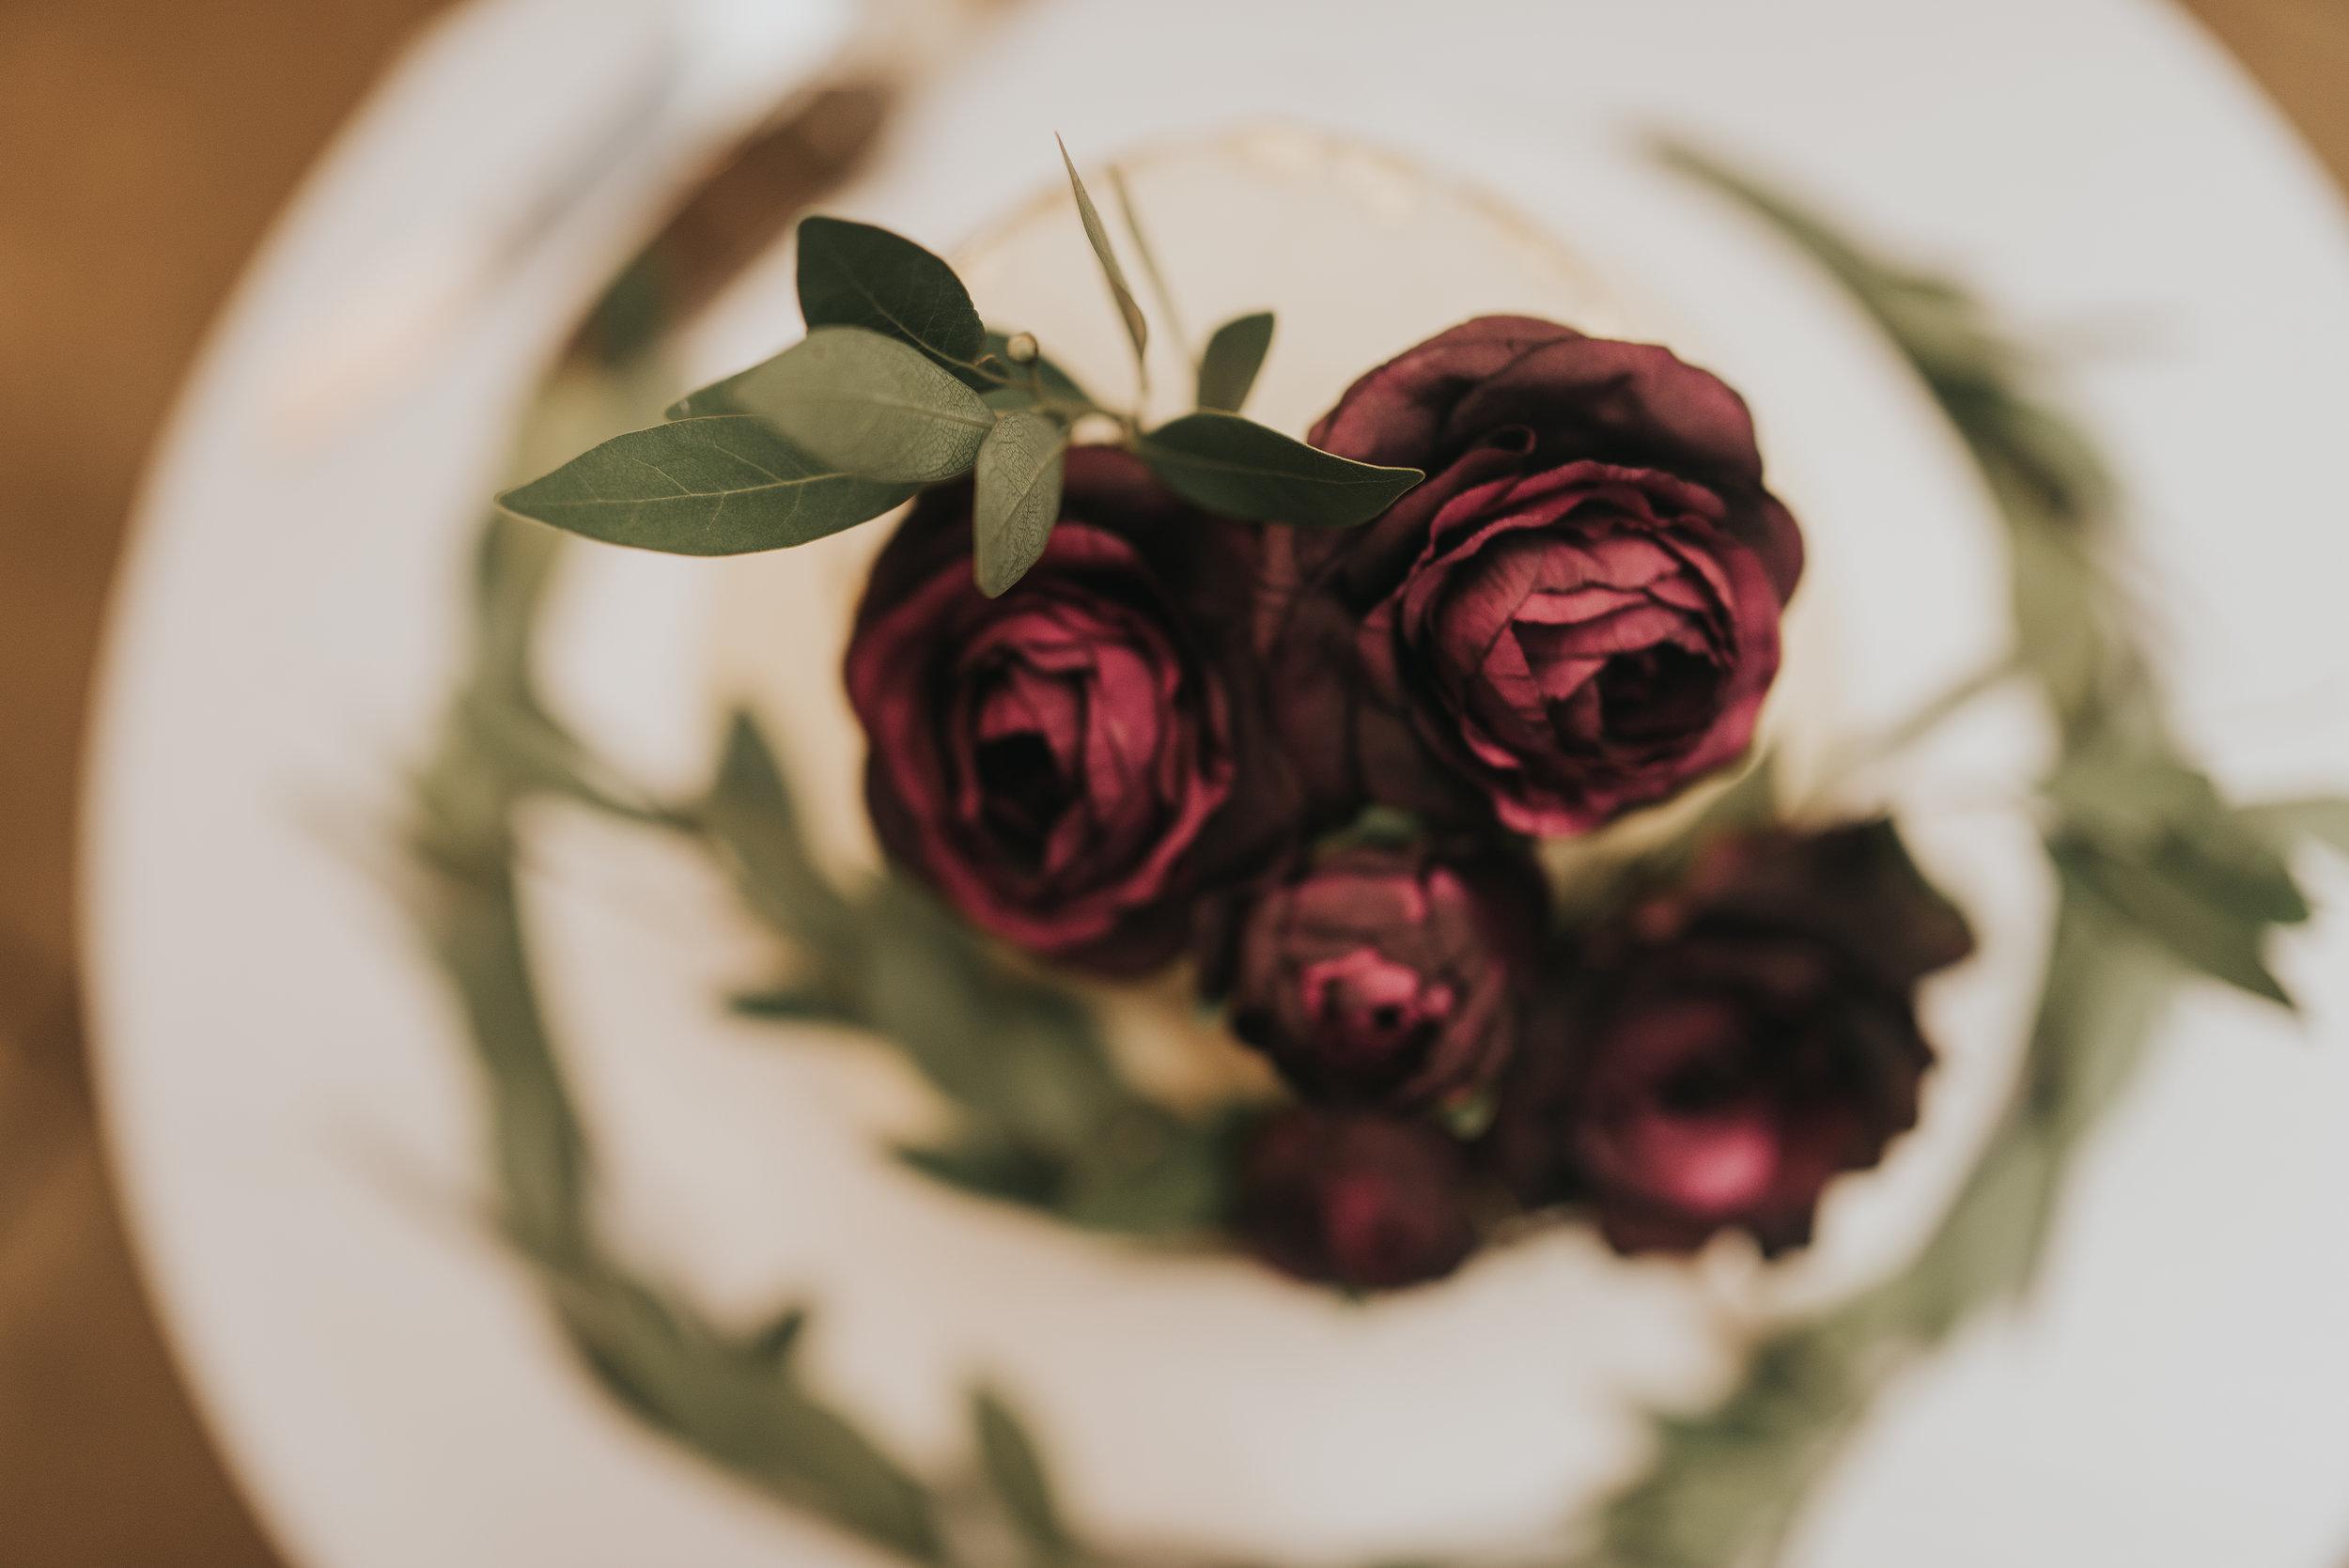 MariahGaryFINALwedding-126.jpg